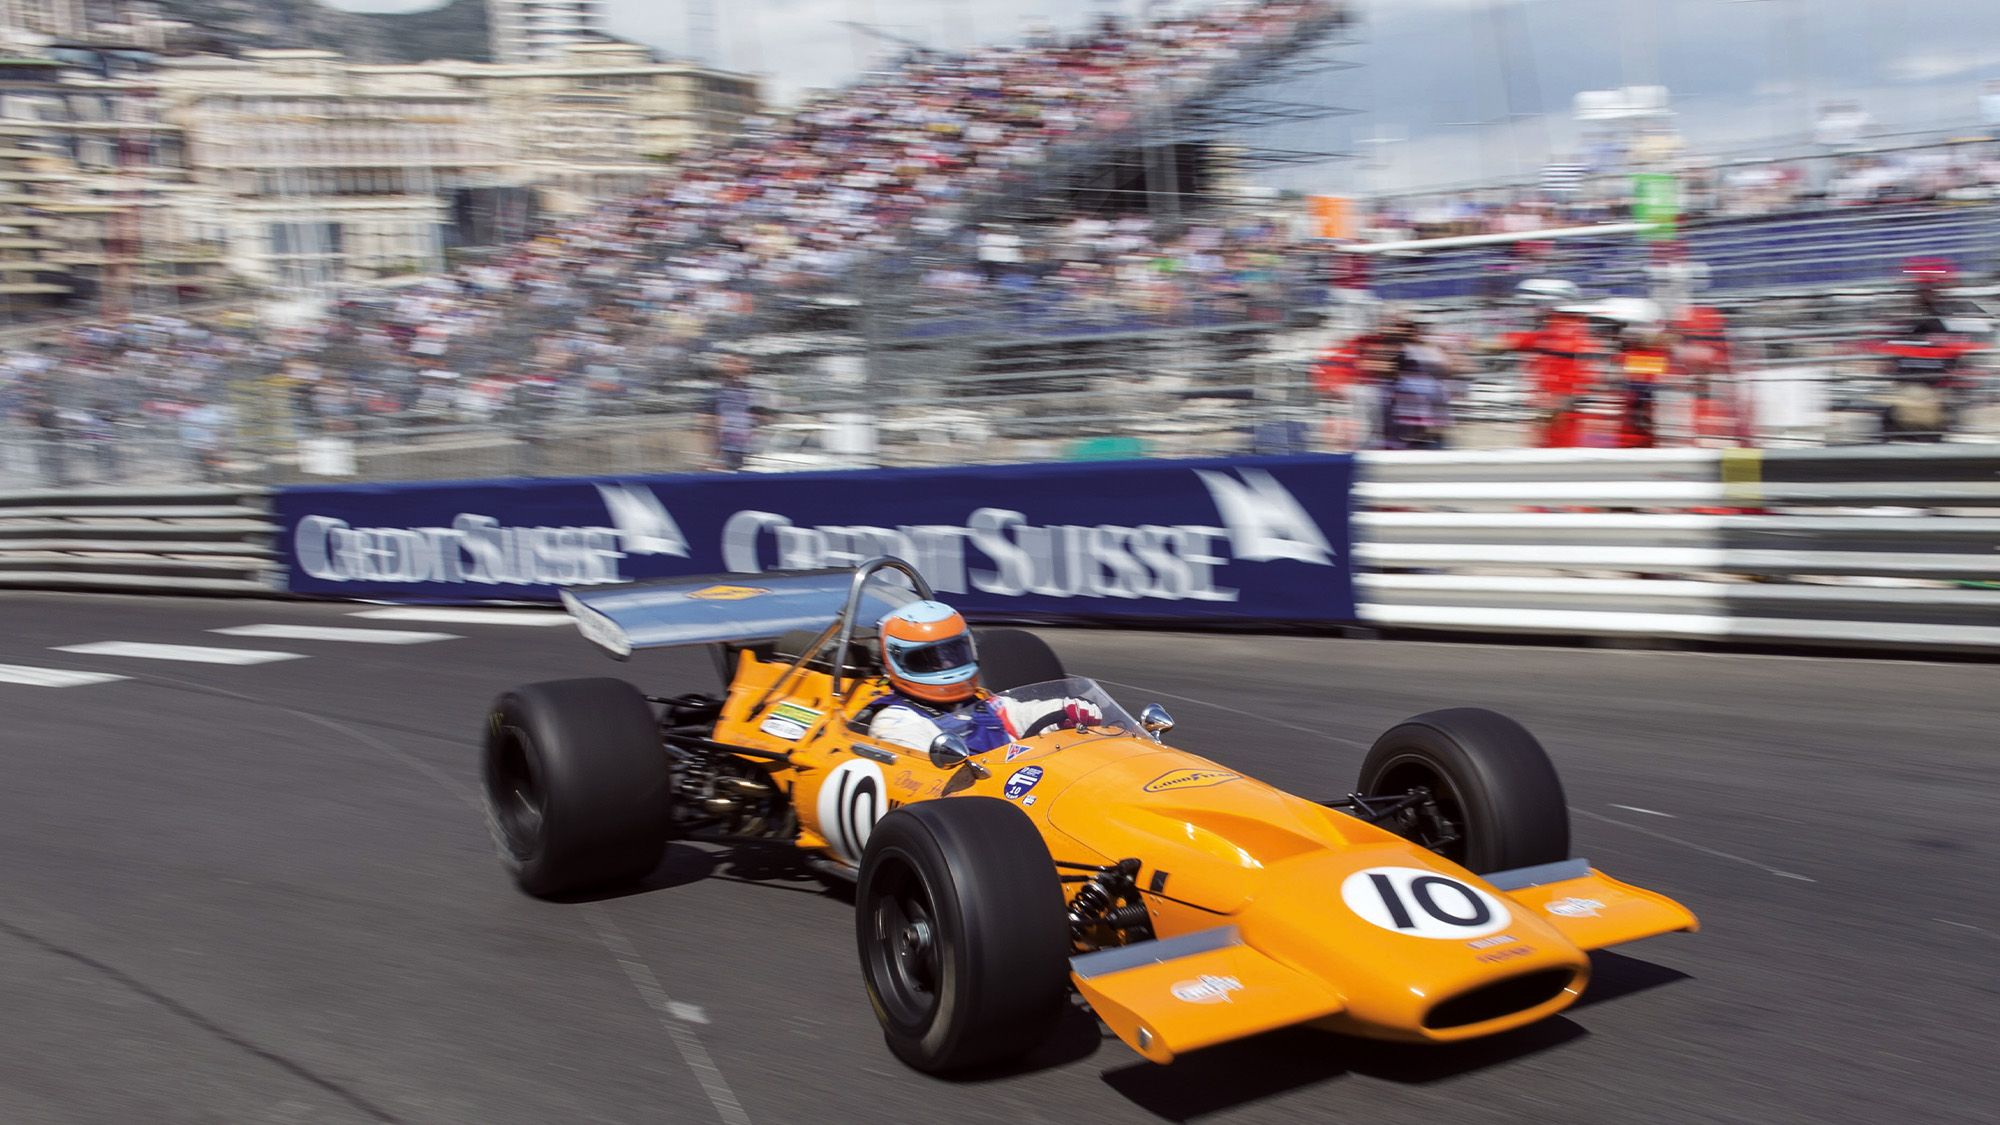 McLaren M14 at 2016 Monaco Historic Grand Prix